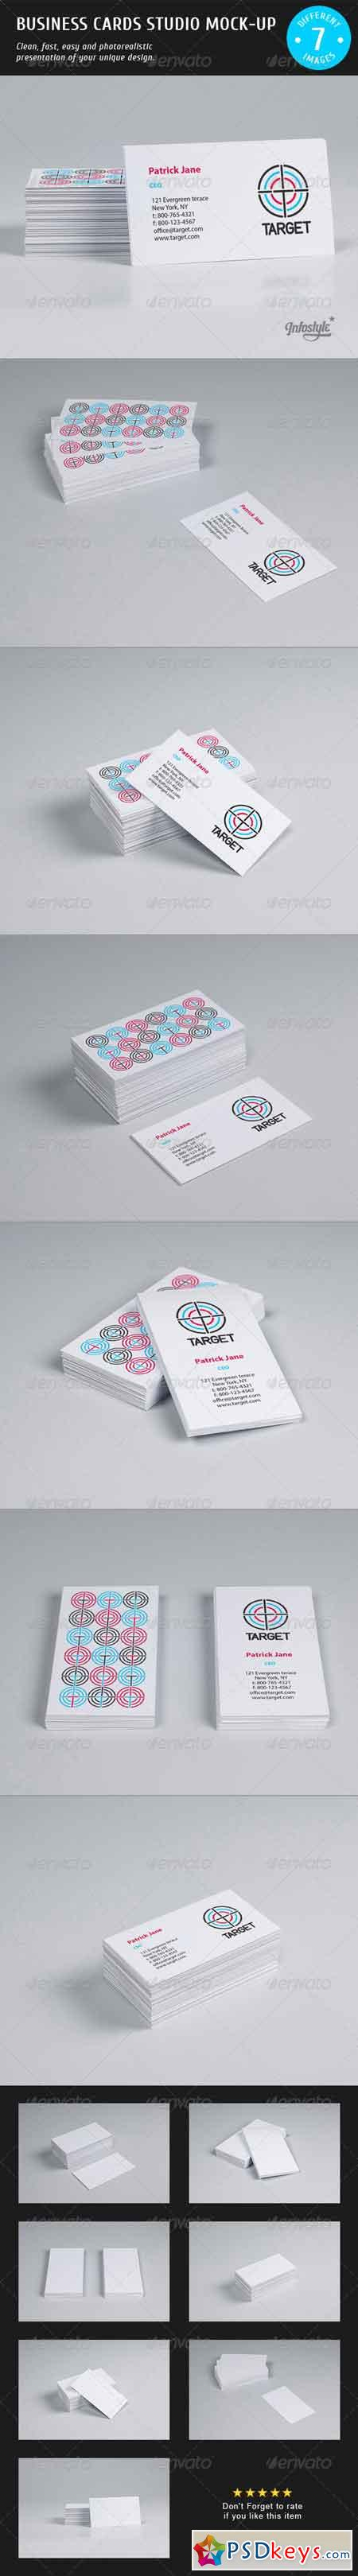 Business cards studio mock up 3892218 free download photoshop business cards studio mock up 3892218 reheart Gallery